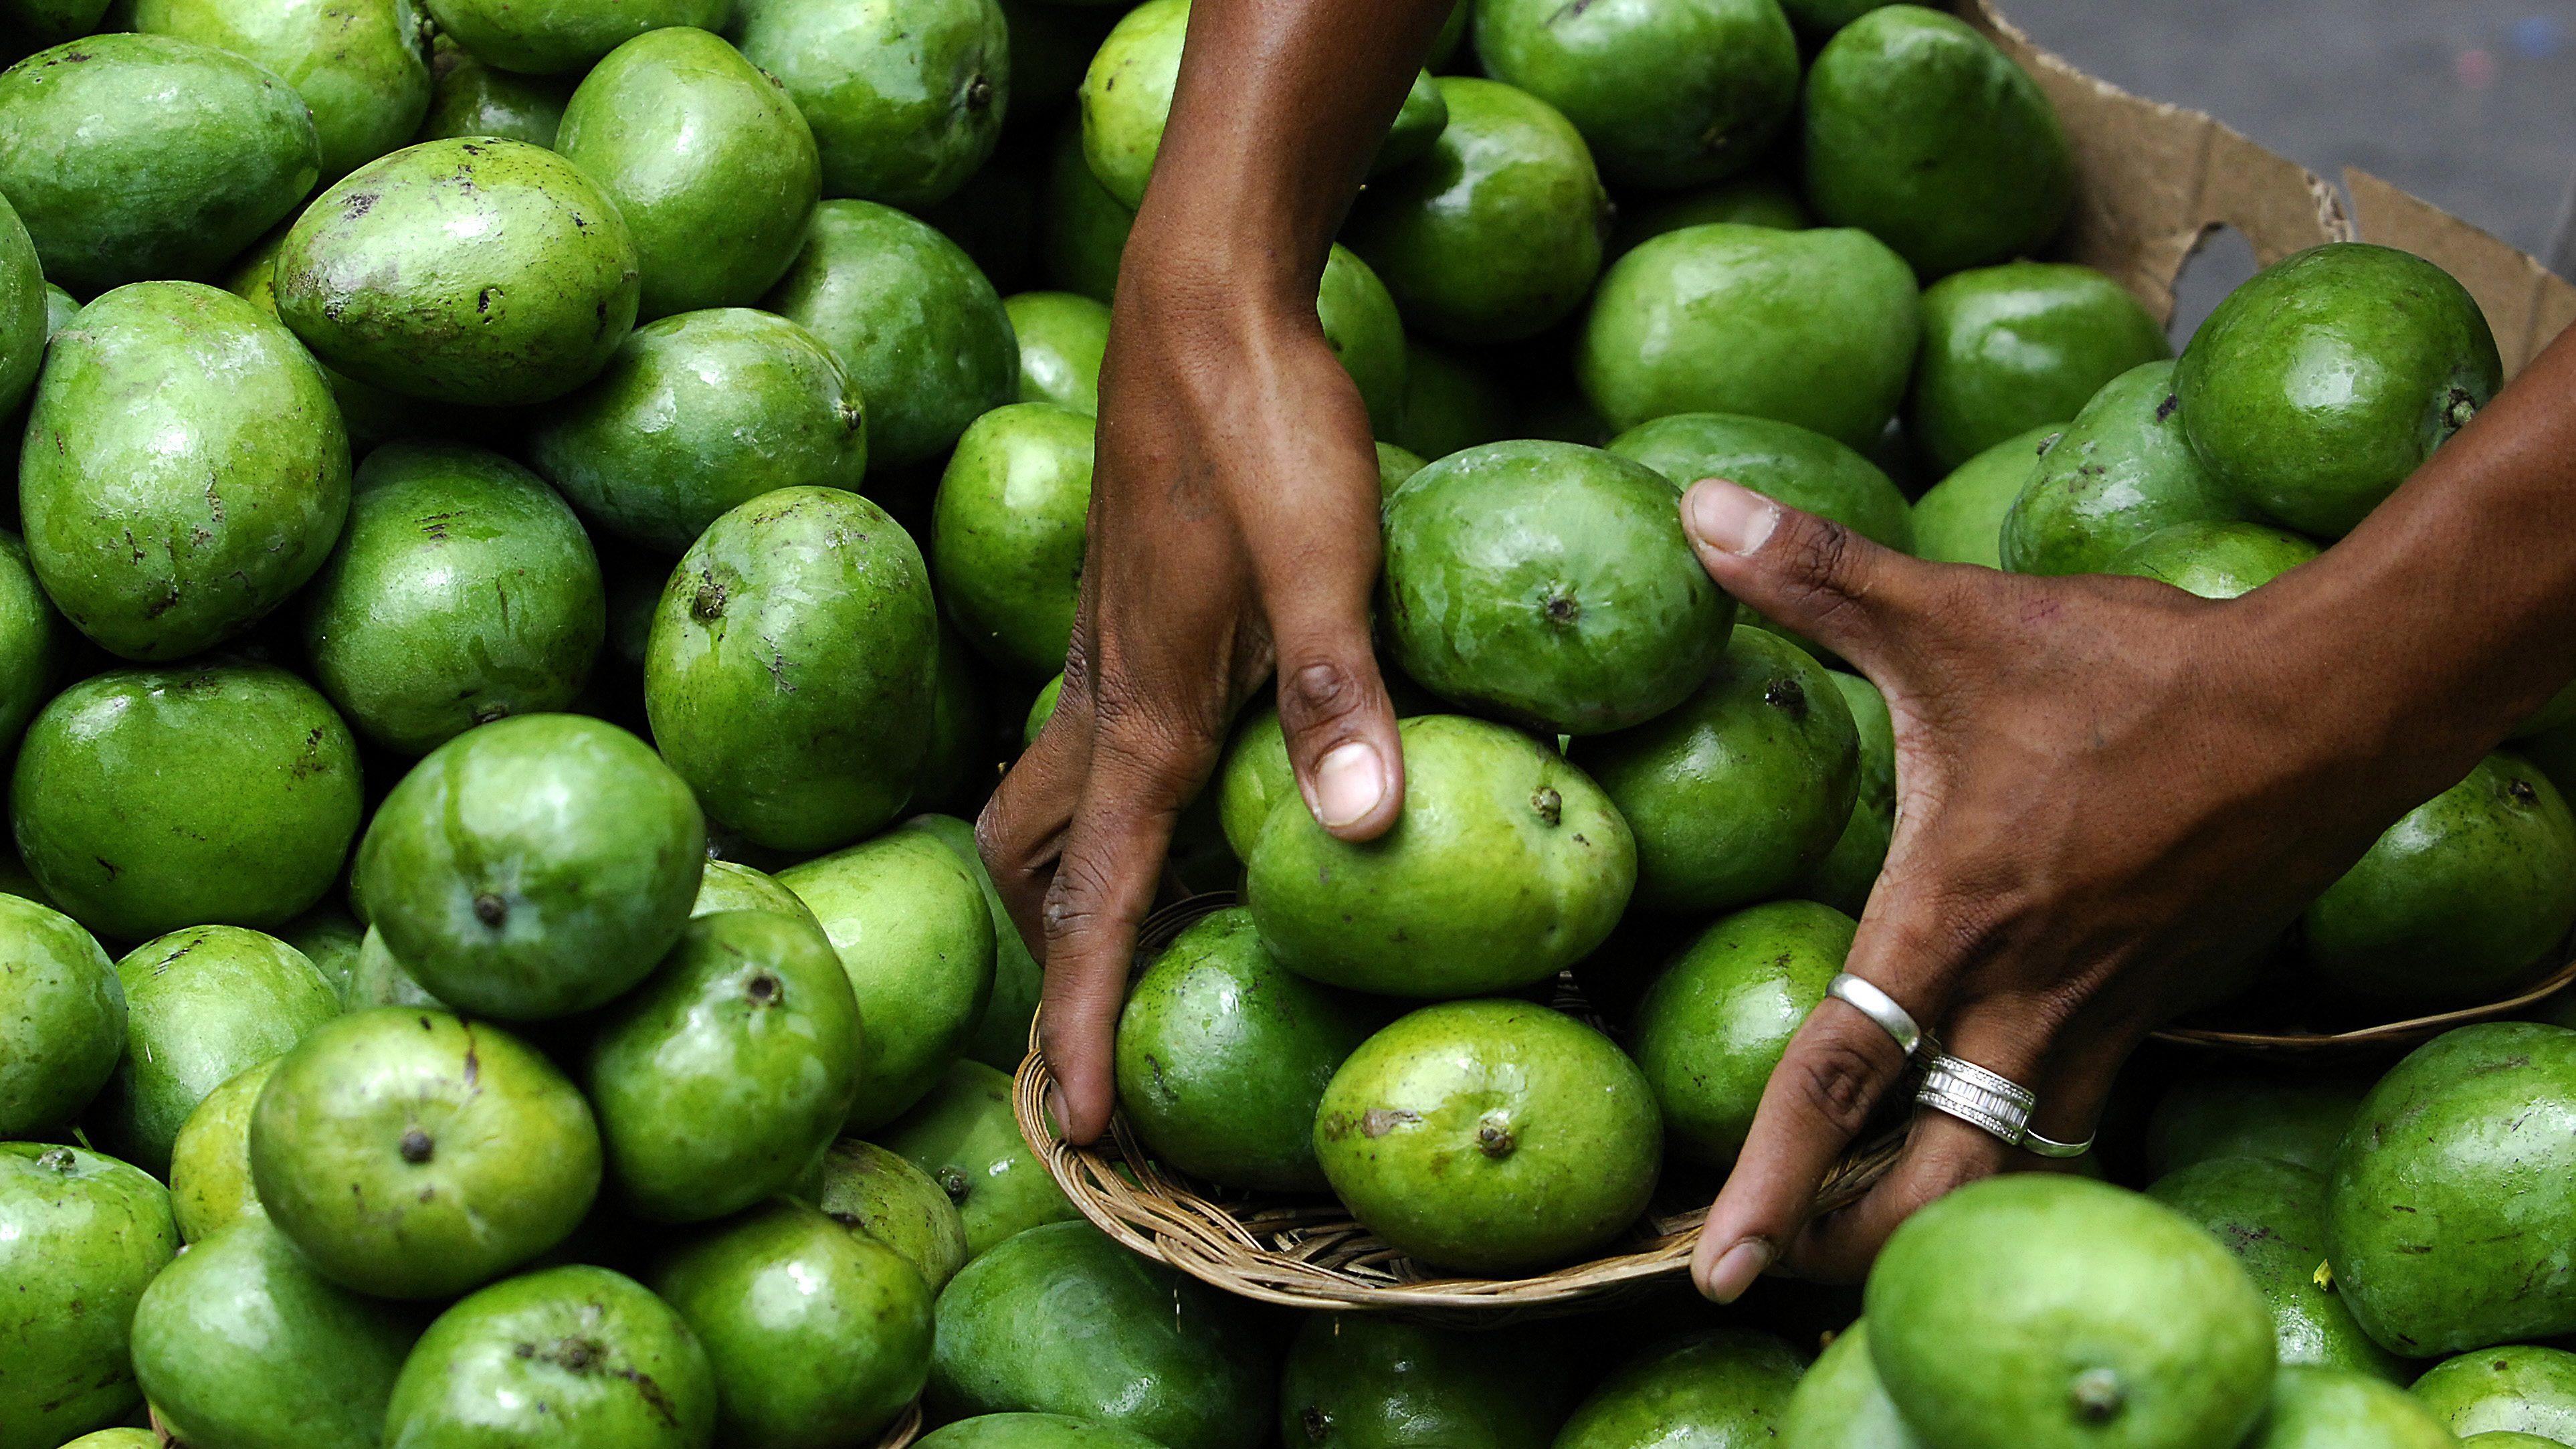 How Philippines plans to sell mango bumper crop — Quartz